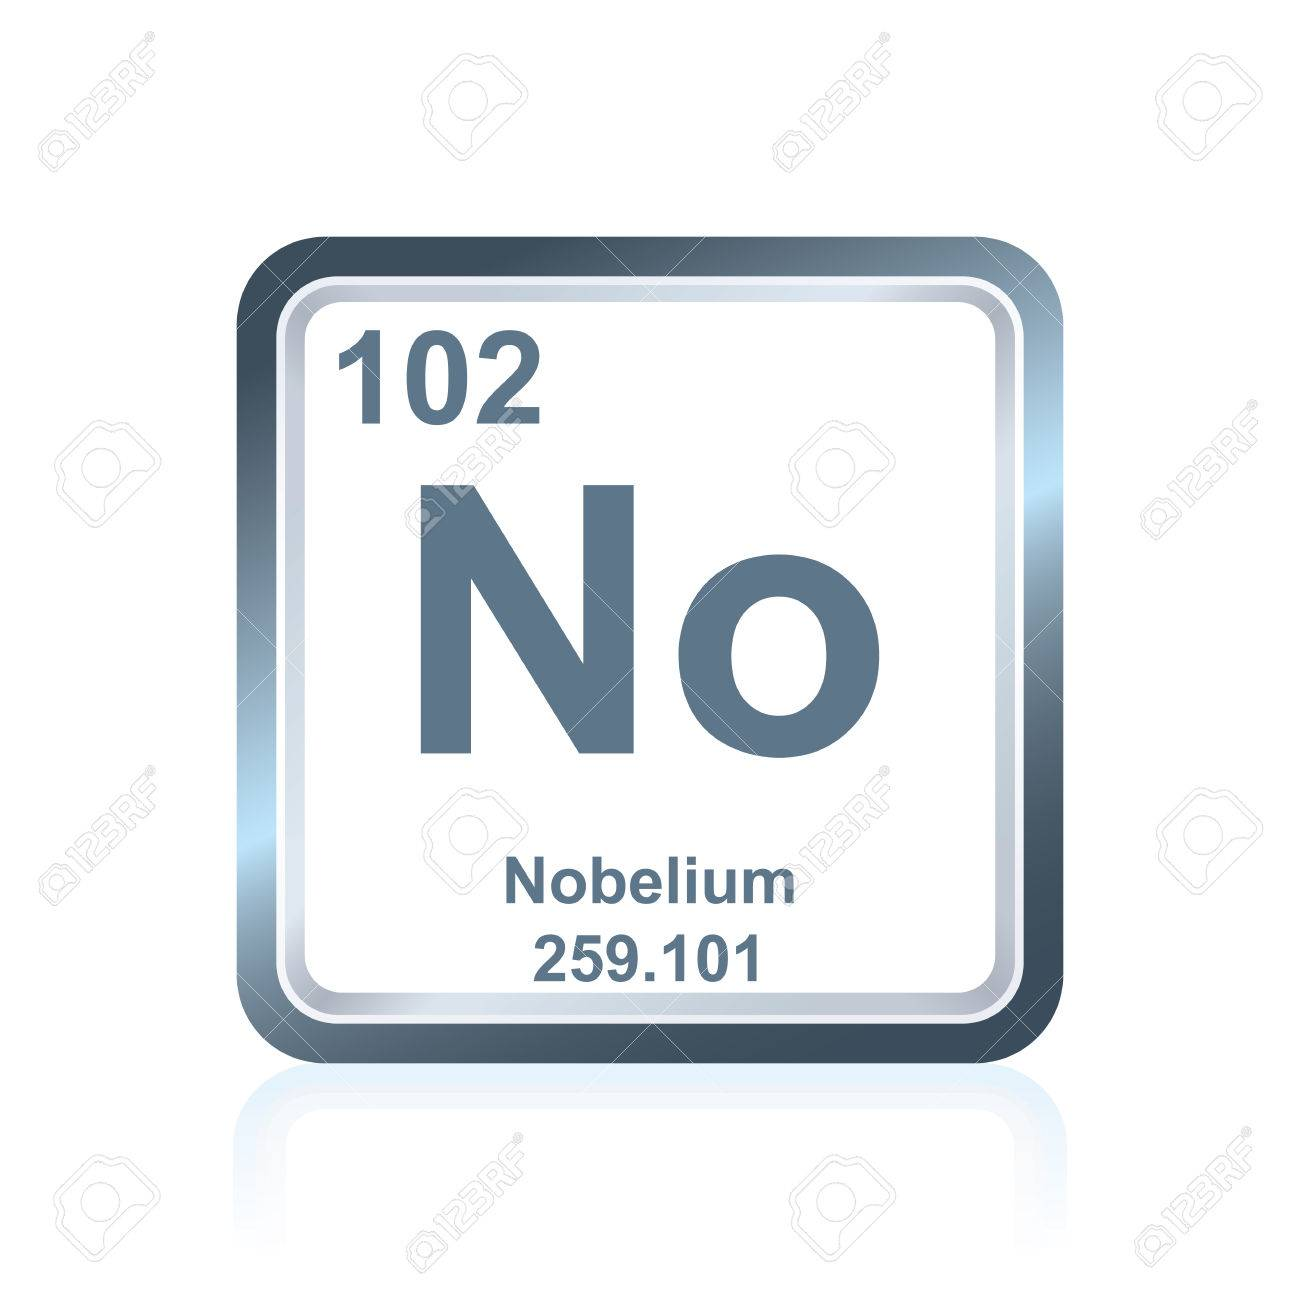 N element periodic table gallery periodic table images symbol of chemical element nobelium as seen on the periodic table symbol of chemical element nobelium gamestrikefo Image collections